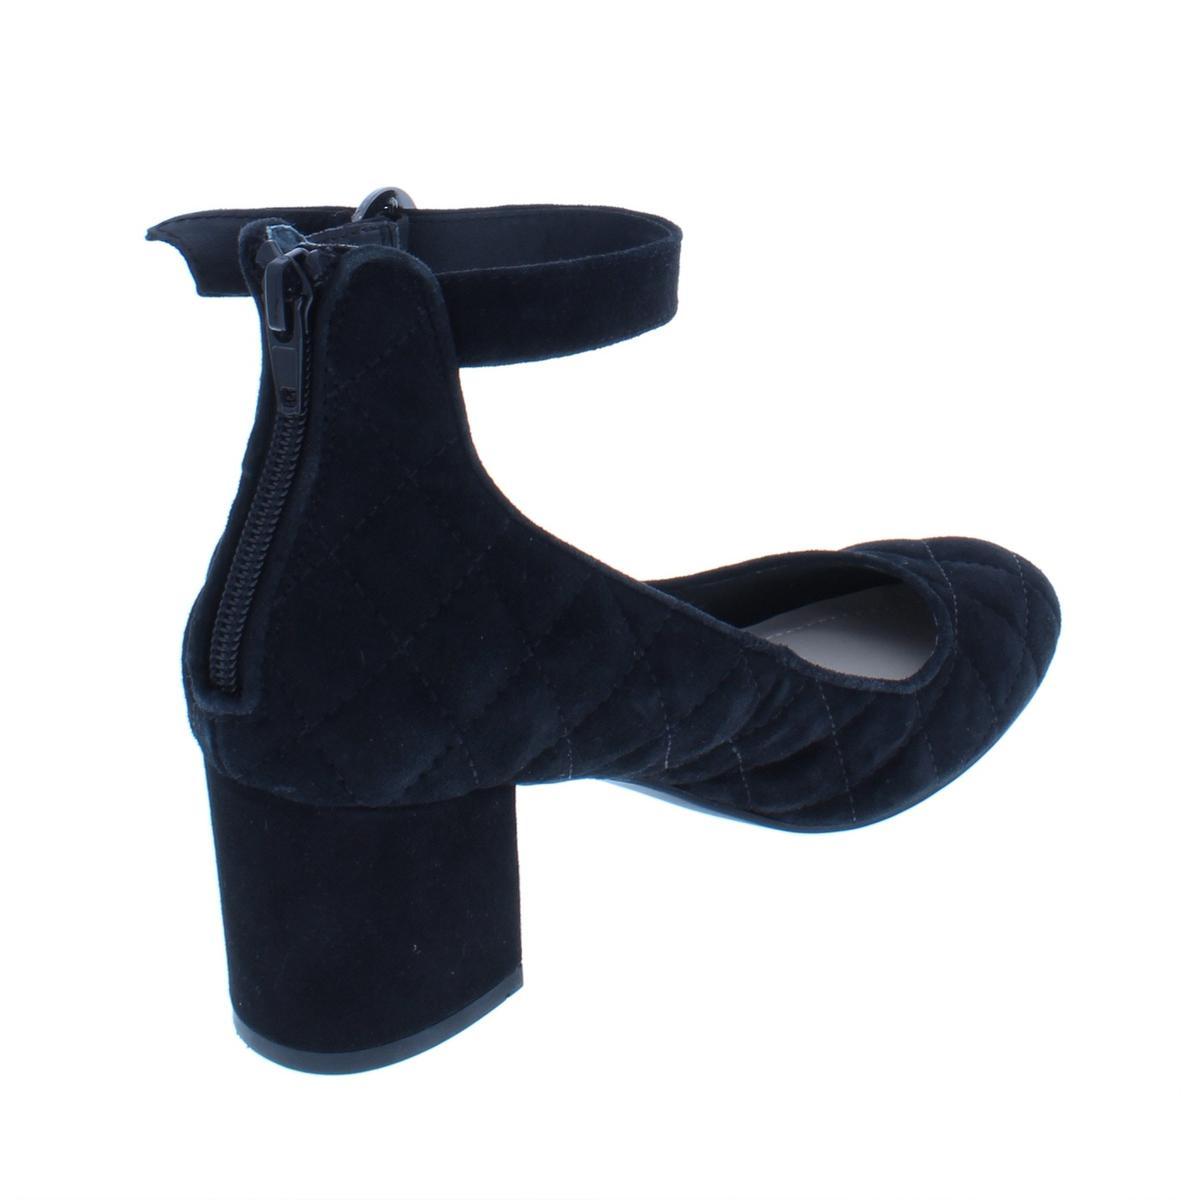 Alfani-Femme-ashiaa-Cheville-Sangle-Escarpins-Chaussures-BHFO-5590 miniature 7